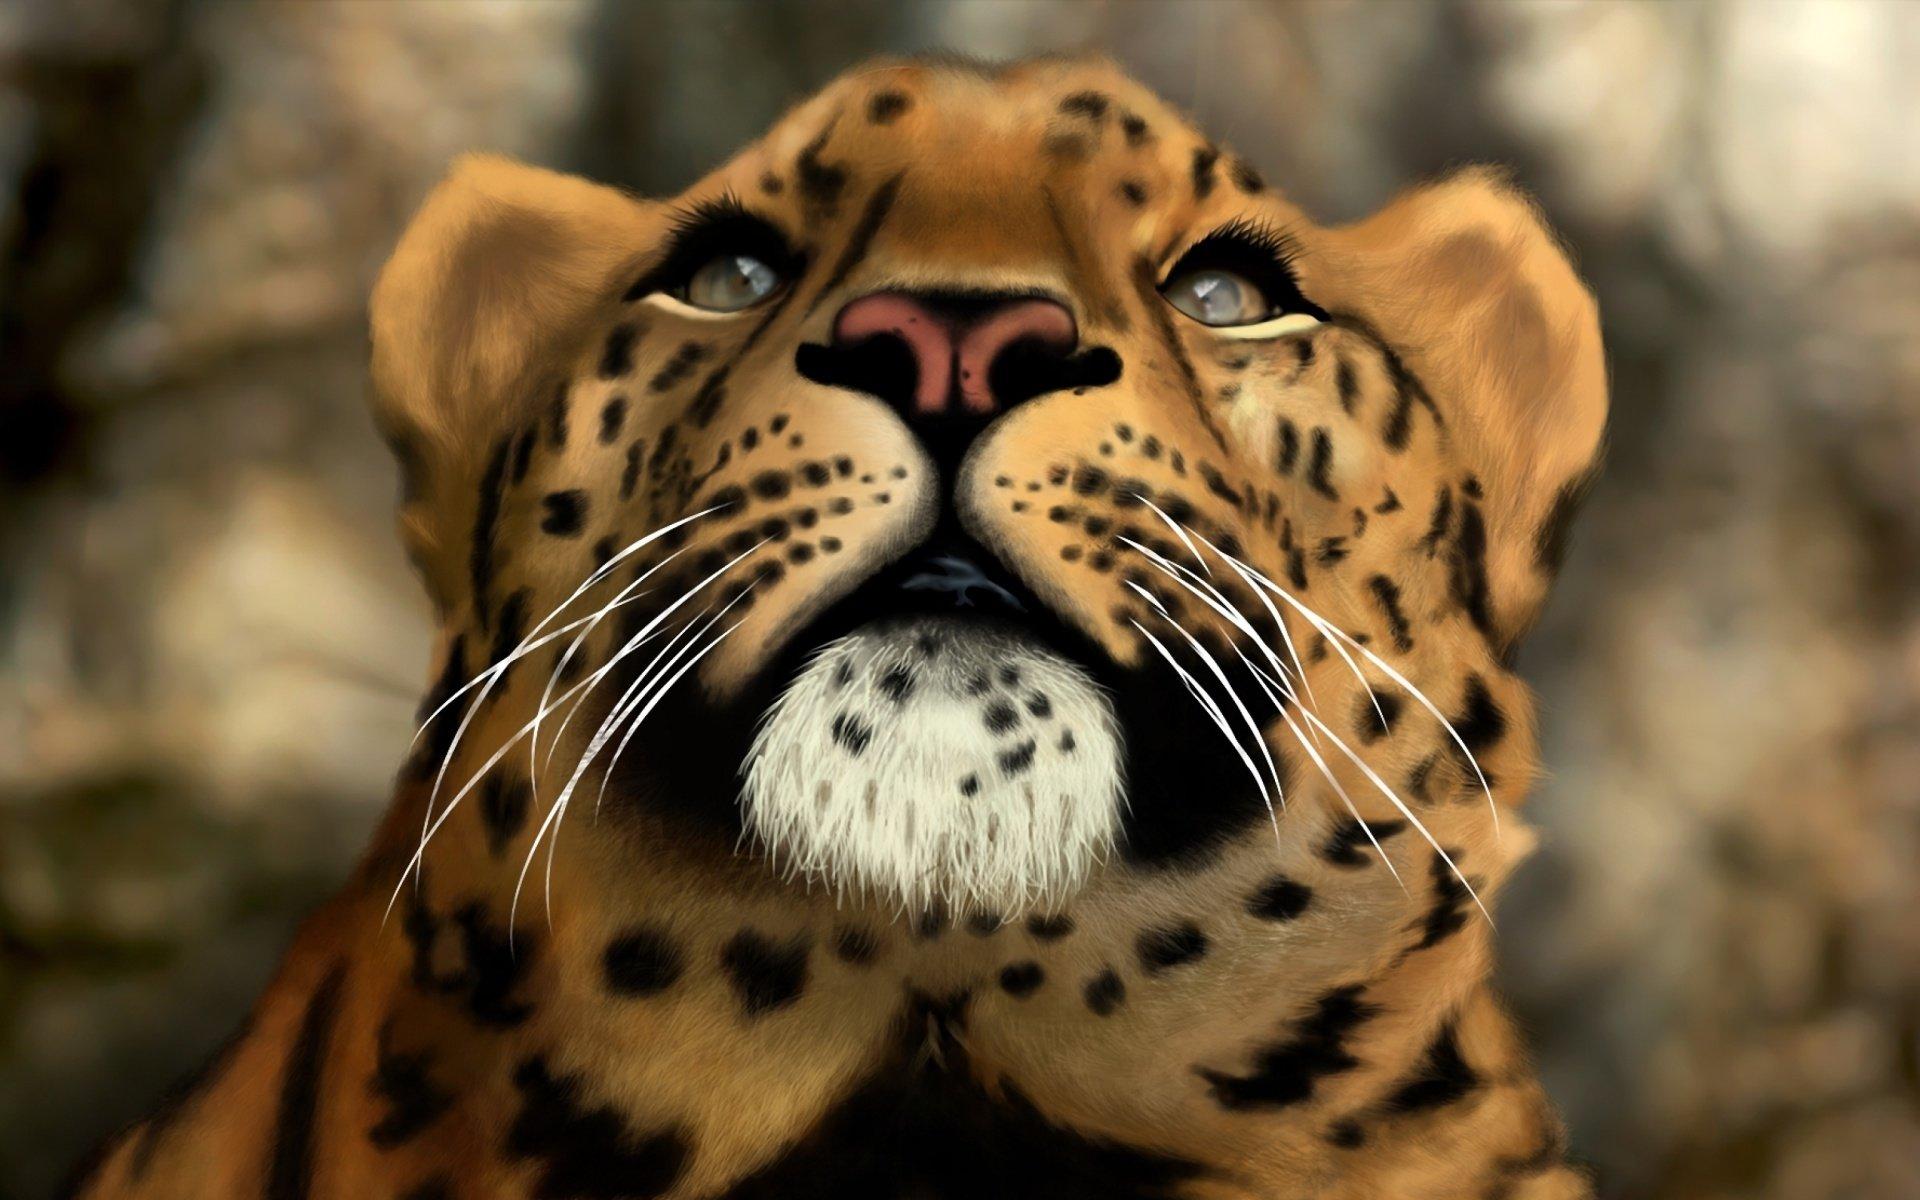 Hd wallpaper jaguar - Hd Wallpaper Background Id 690173 1920x1200 Animal Jaguar